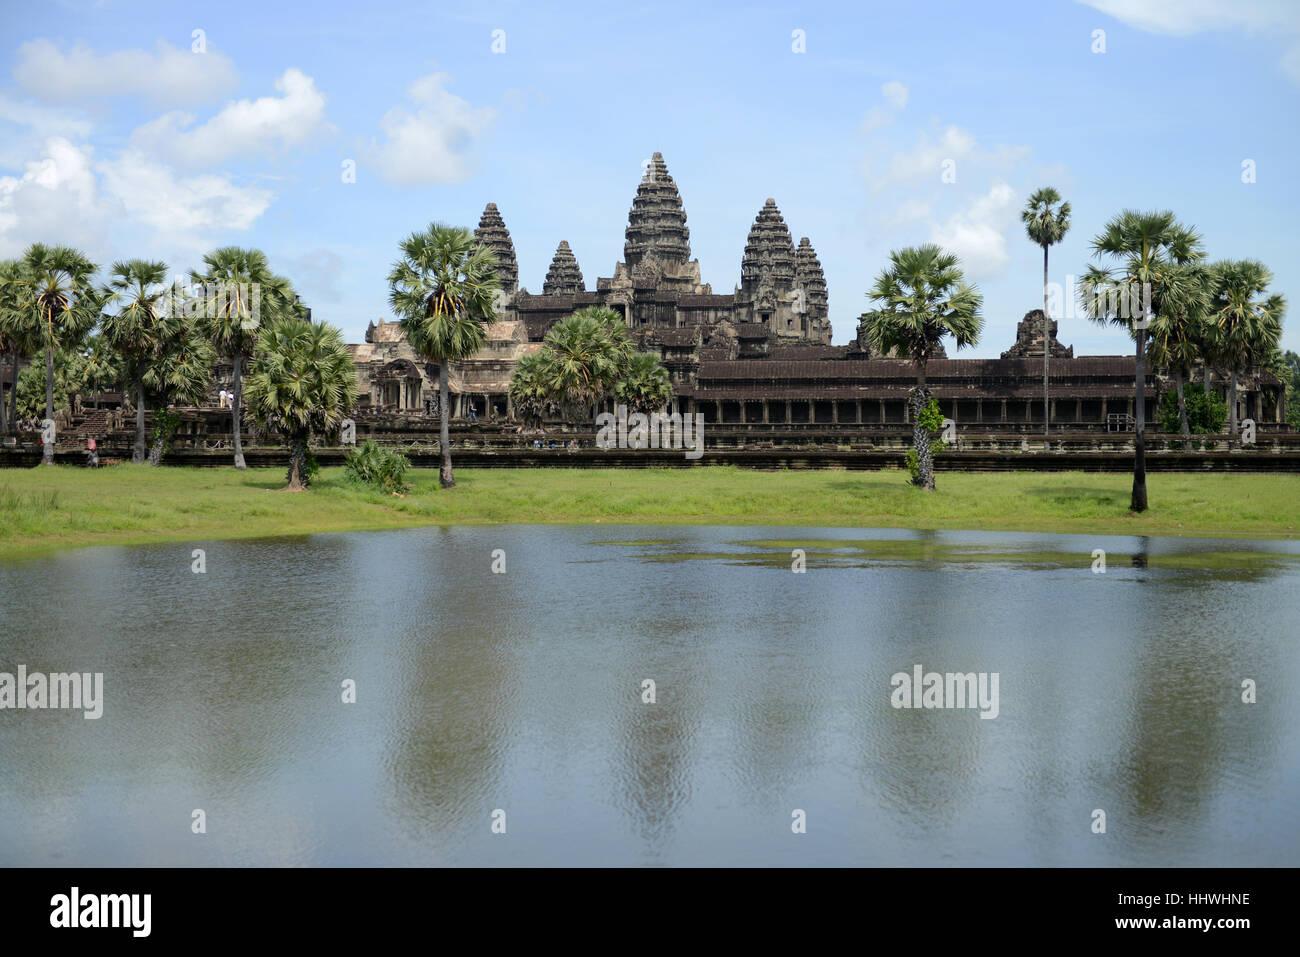 Angkor Wat, Siem Reap, Cambogia, sud-est asiatico. Immagini Stock